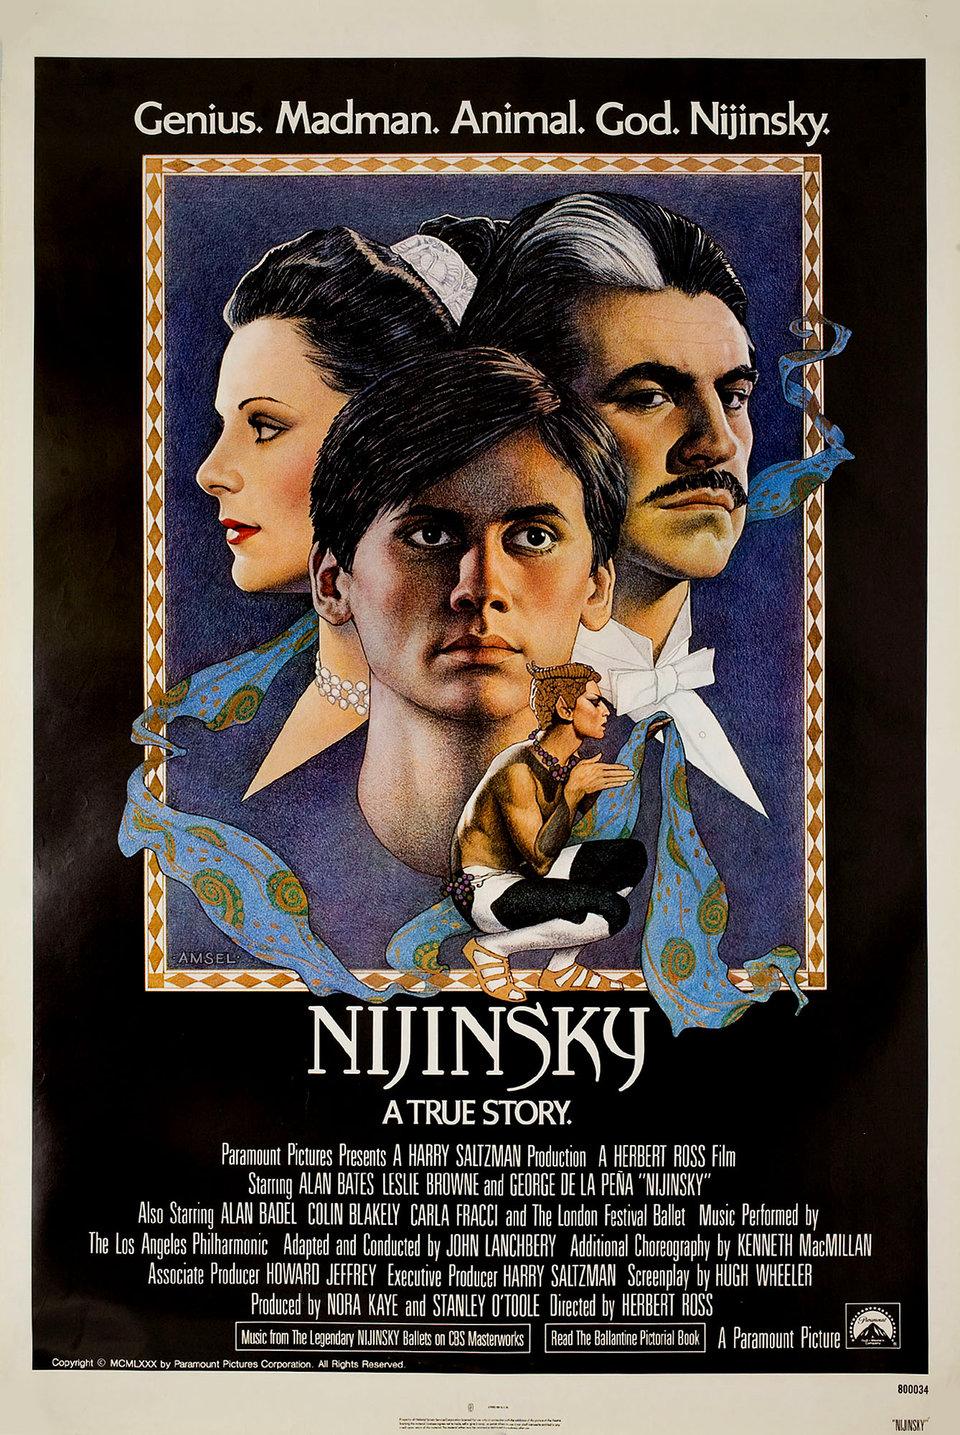 Nijinsky 1980 U.S. One Sheet Poster